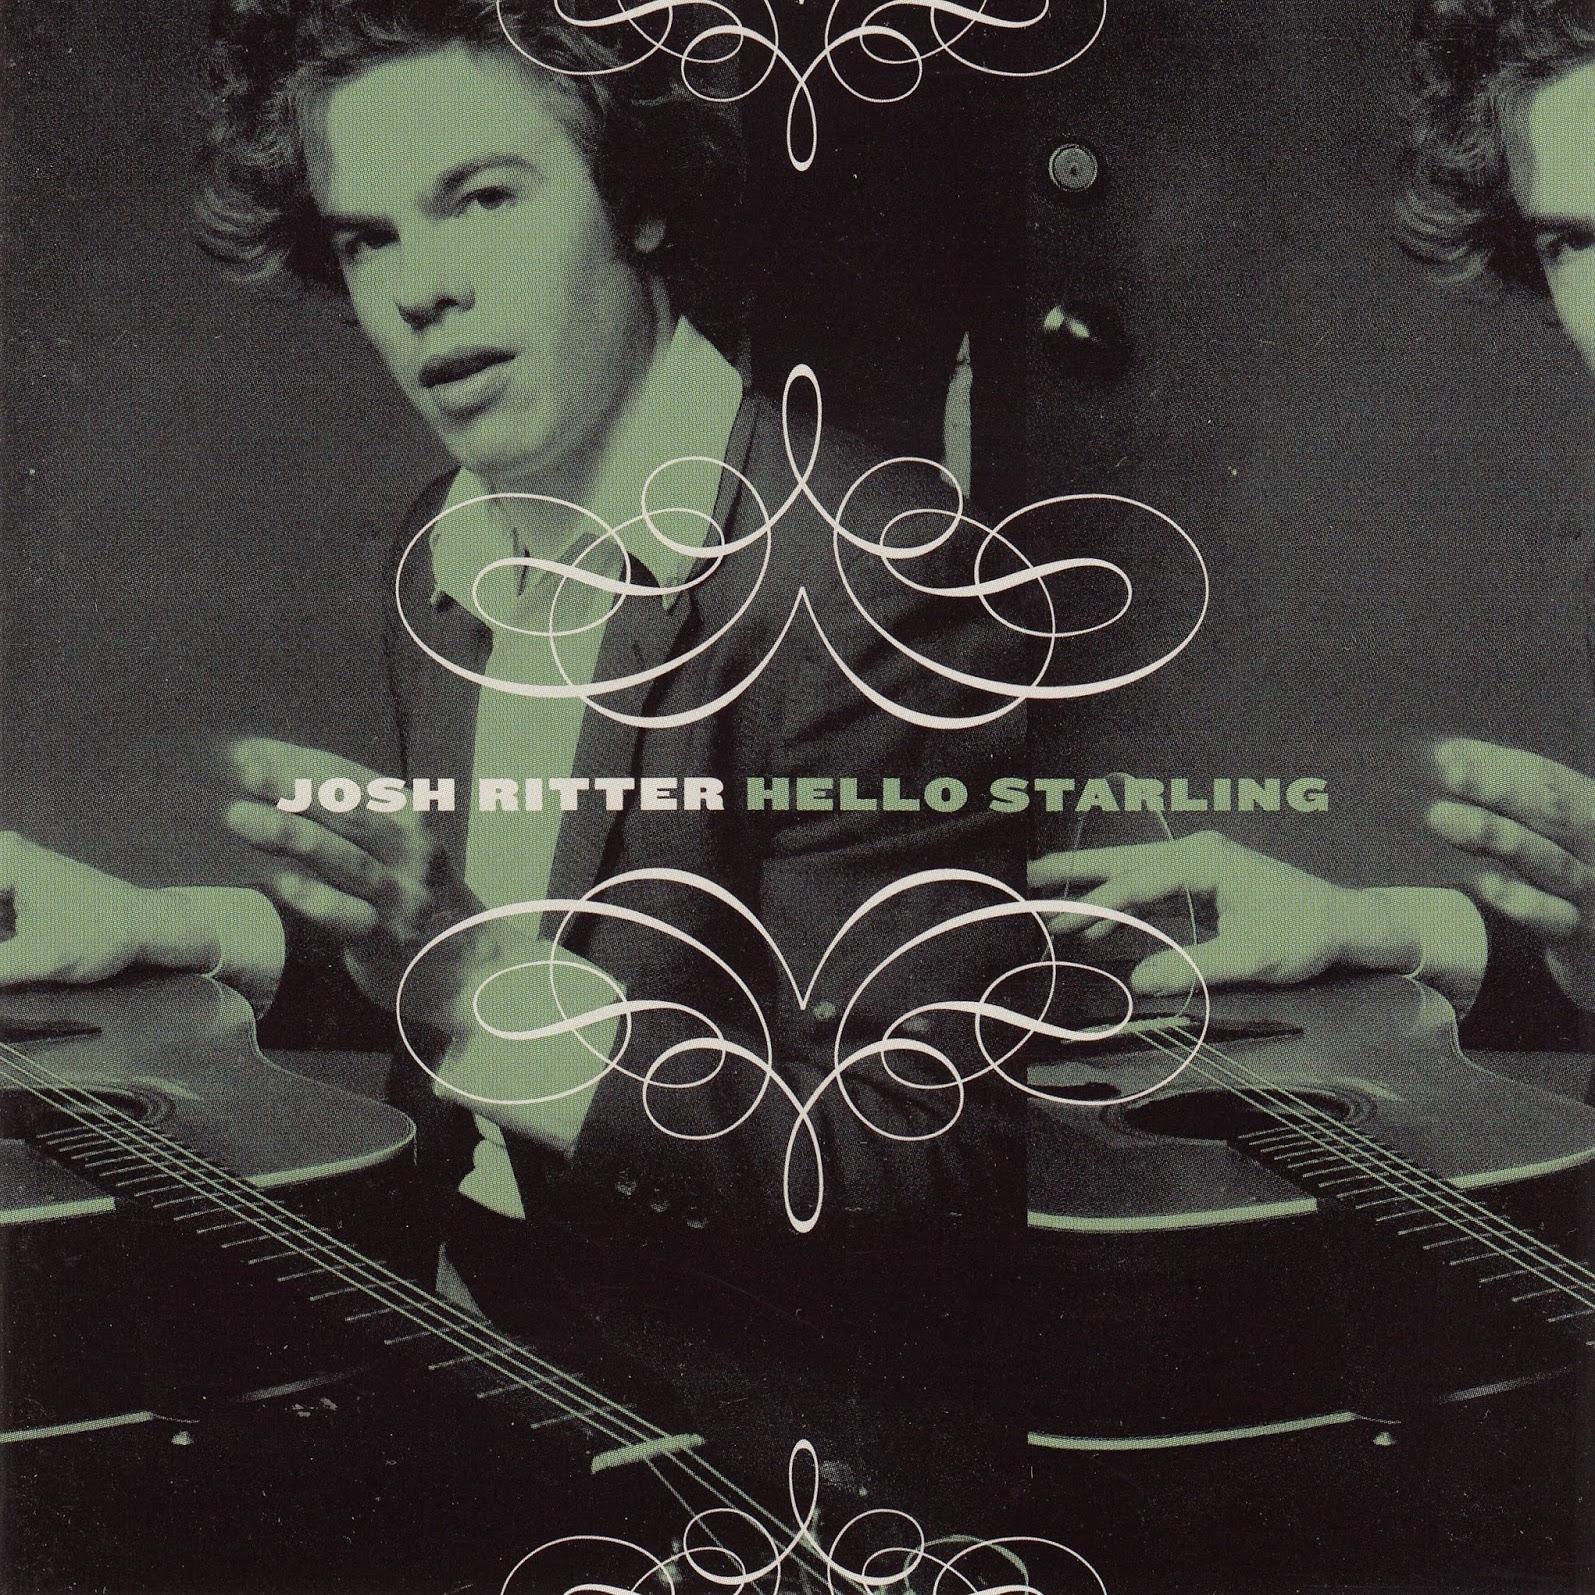 Josh-Ritter-Hello-Starling-Ireland-Front